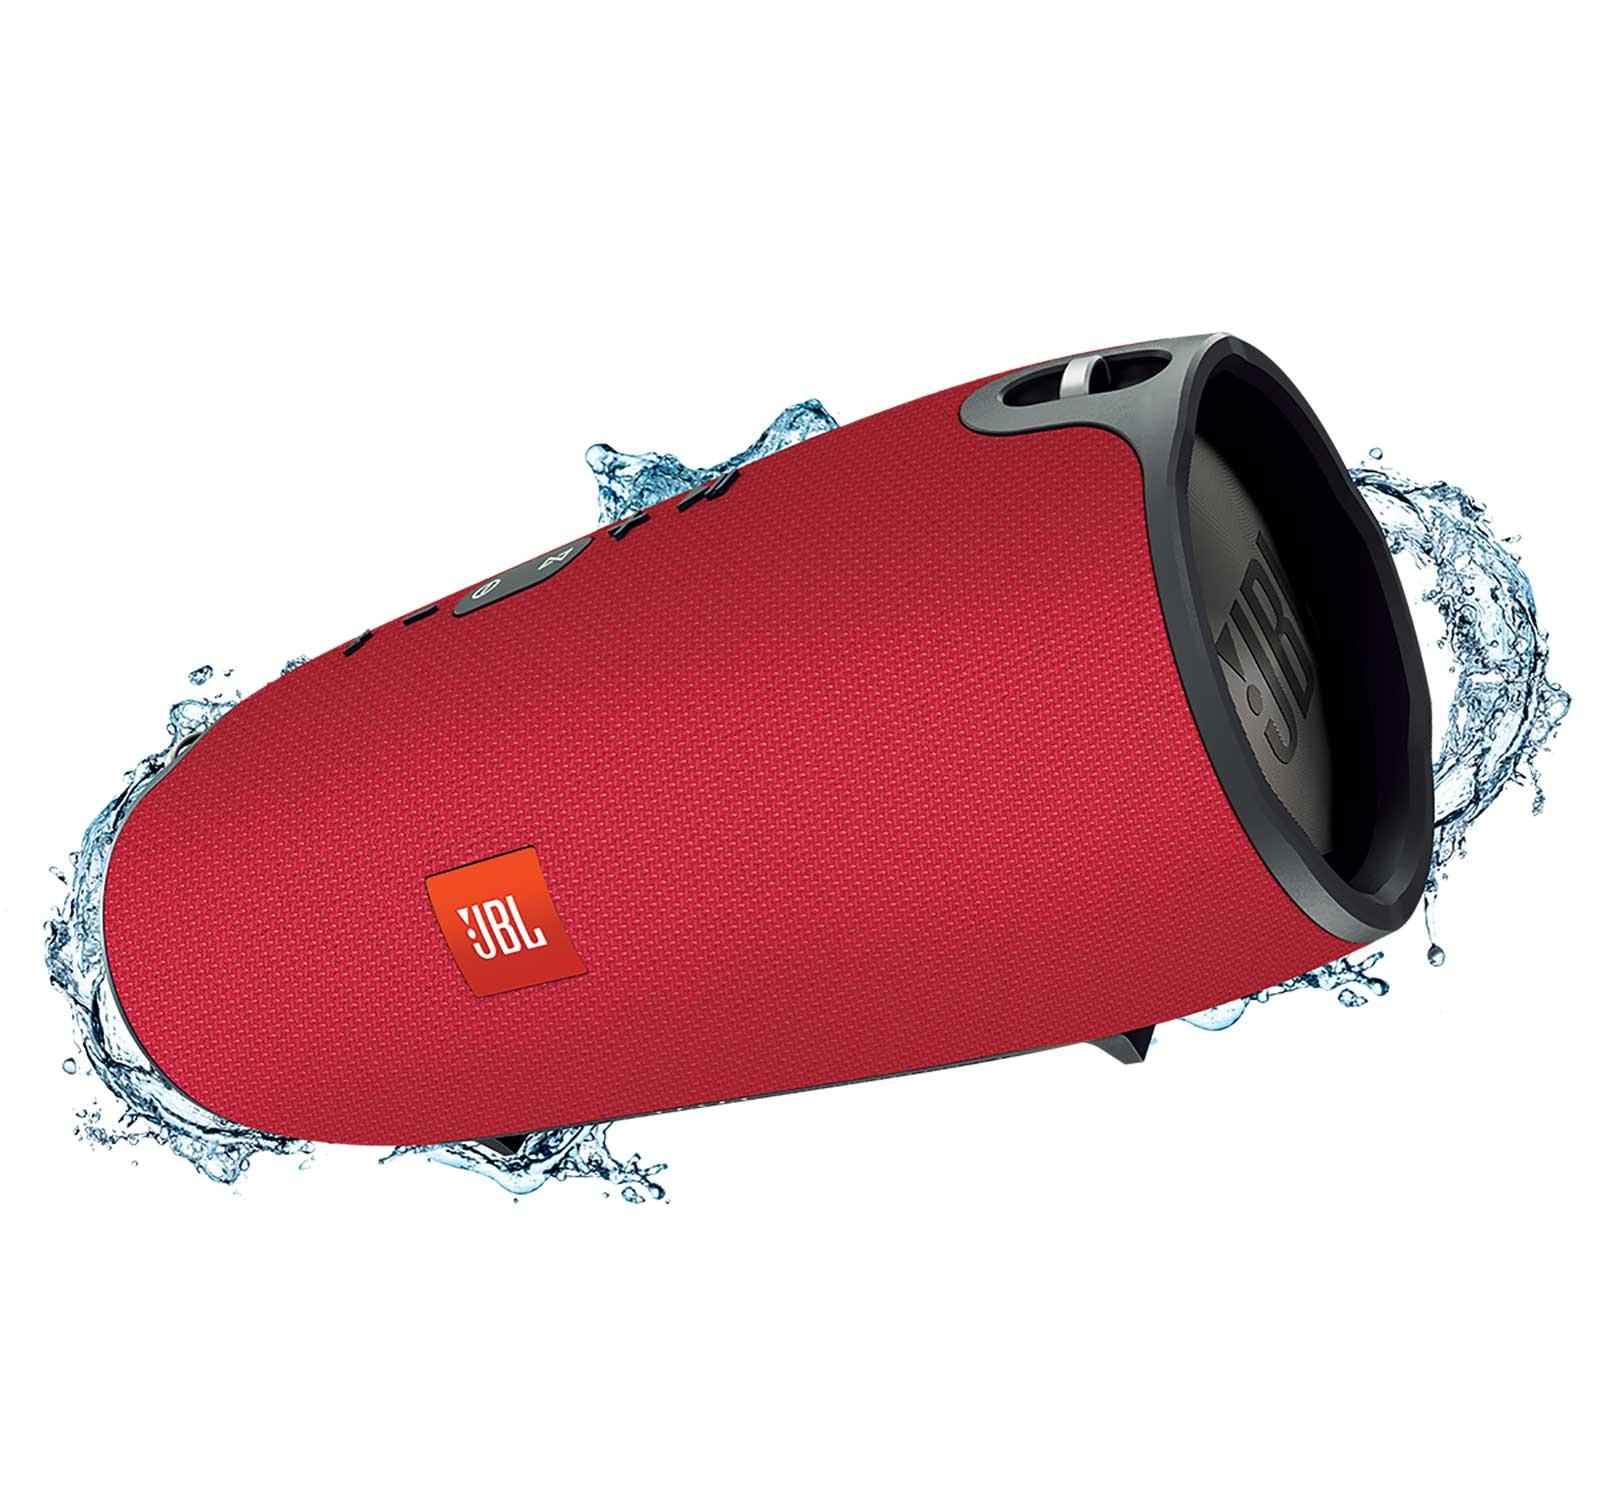 jbl xtreme red open box ultimate splashproof bluetooth. Black Bedroom Furniture Sets. Home Design Ideas